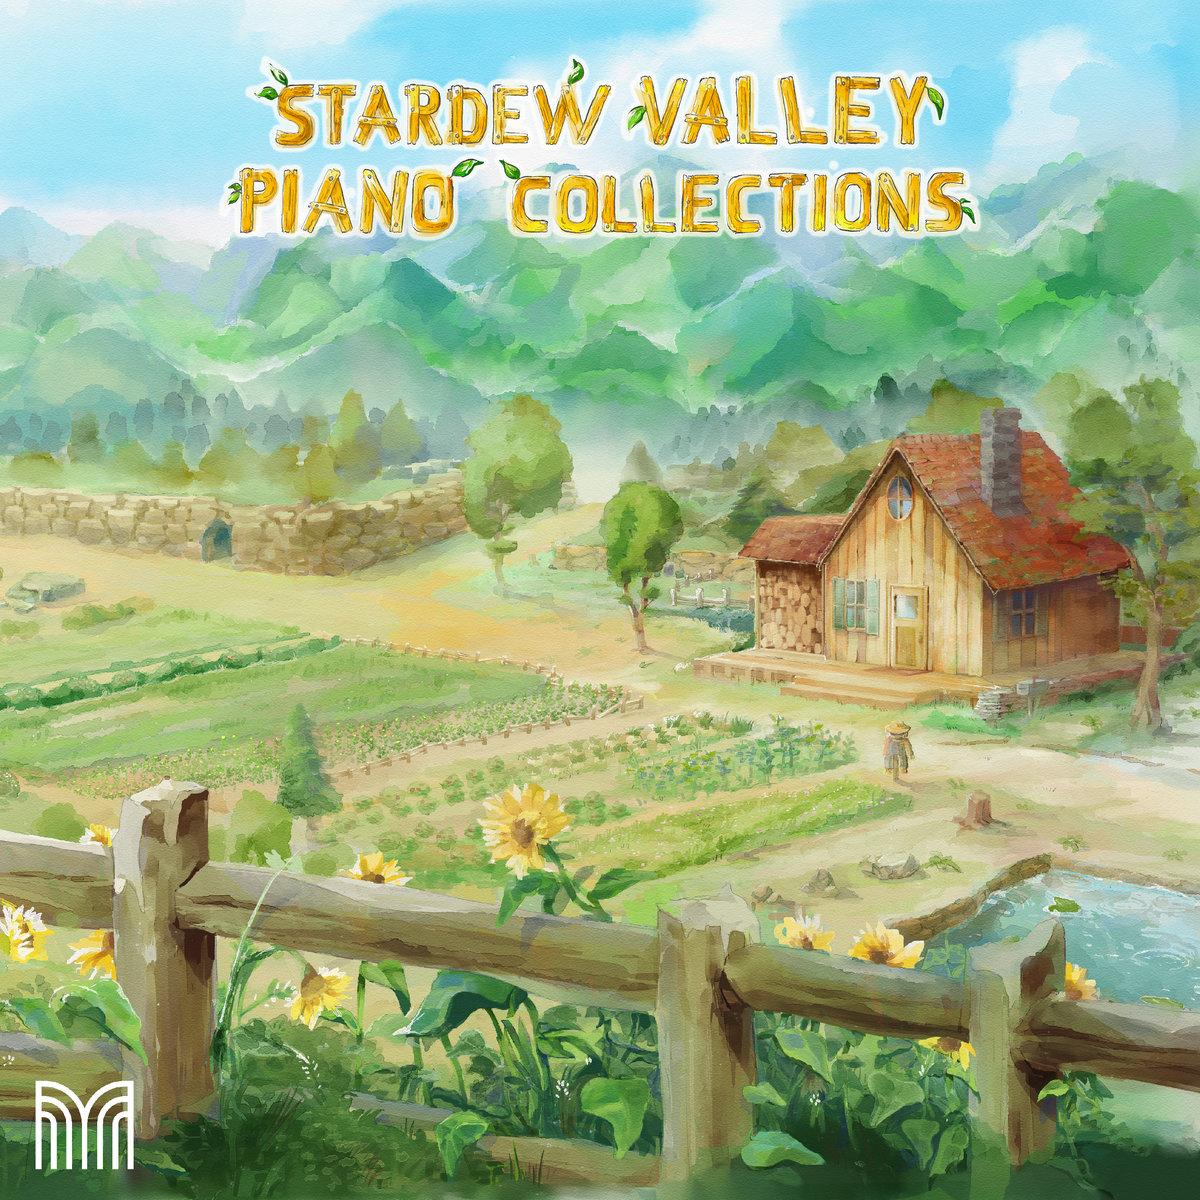 Stardew Valley Piano Collections     (ConcernedApe - arr. Matthew Bridgham)